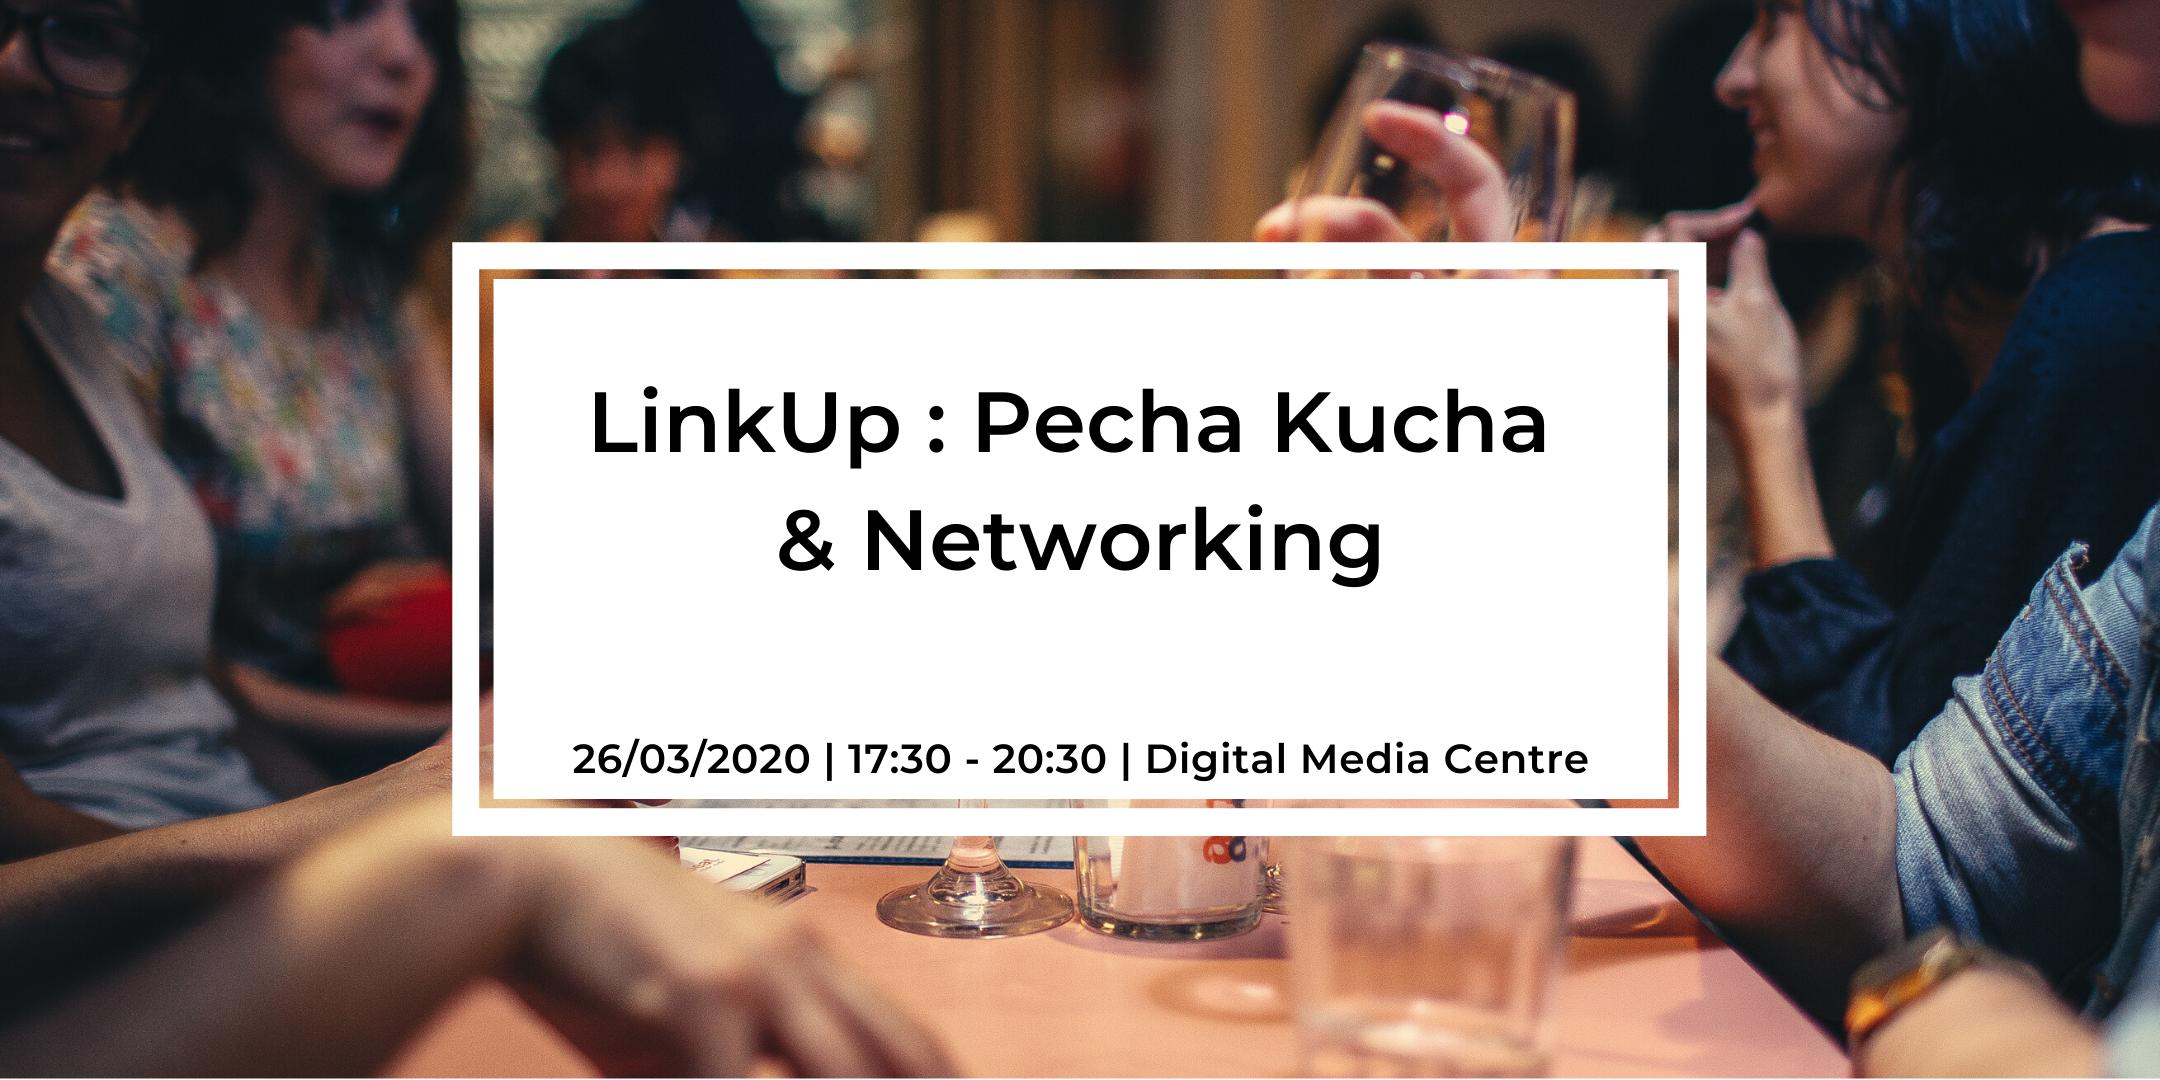 LinkUp : The Young Professionals Network : Pecha Kutcha Evening